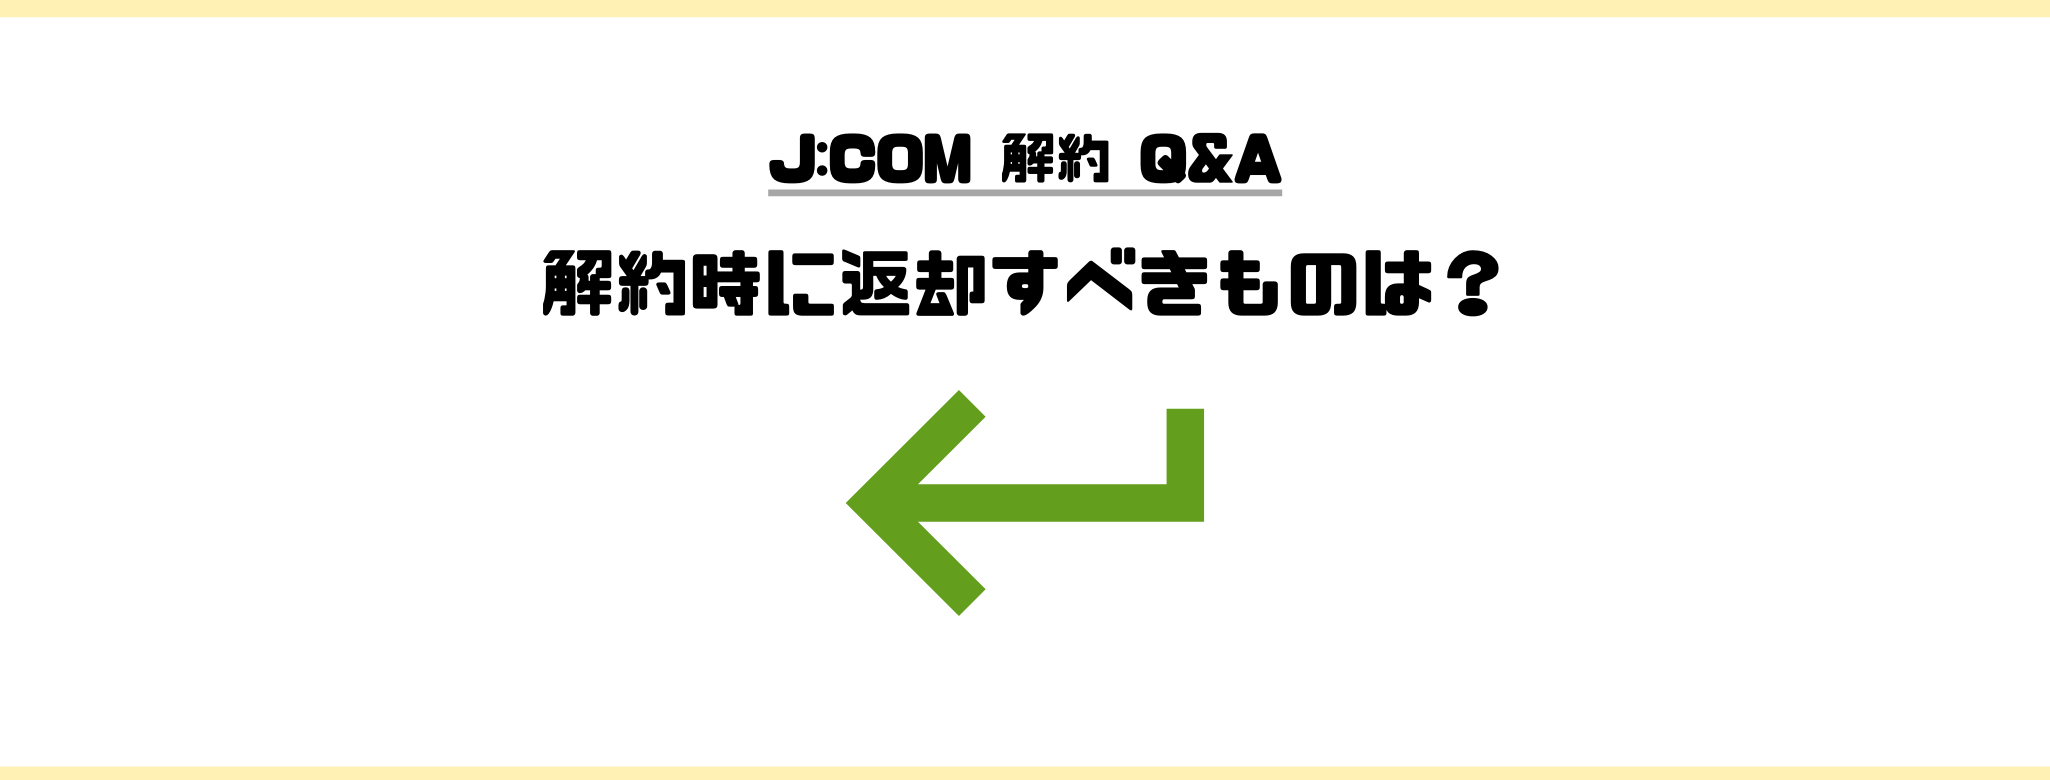 J:COM_解約_返却